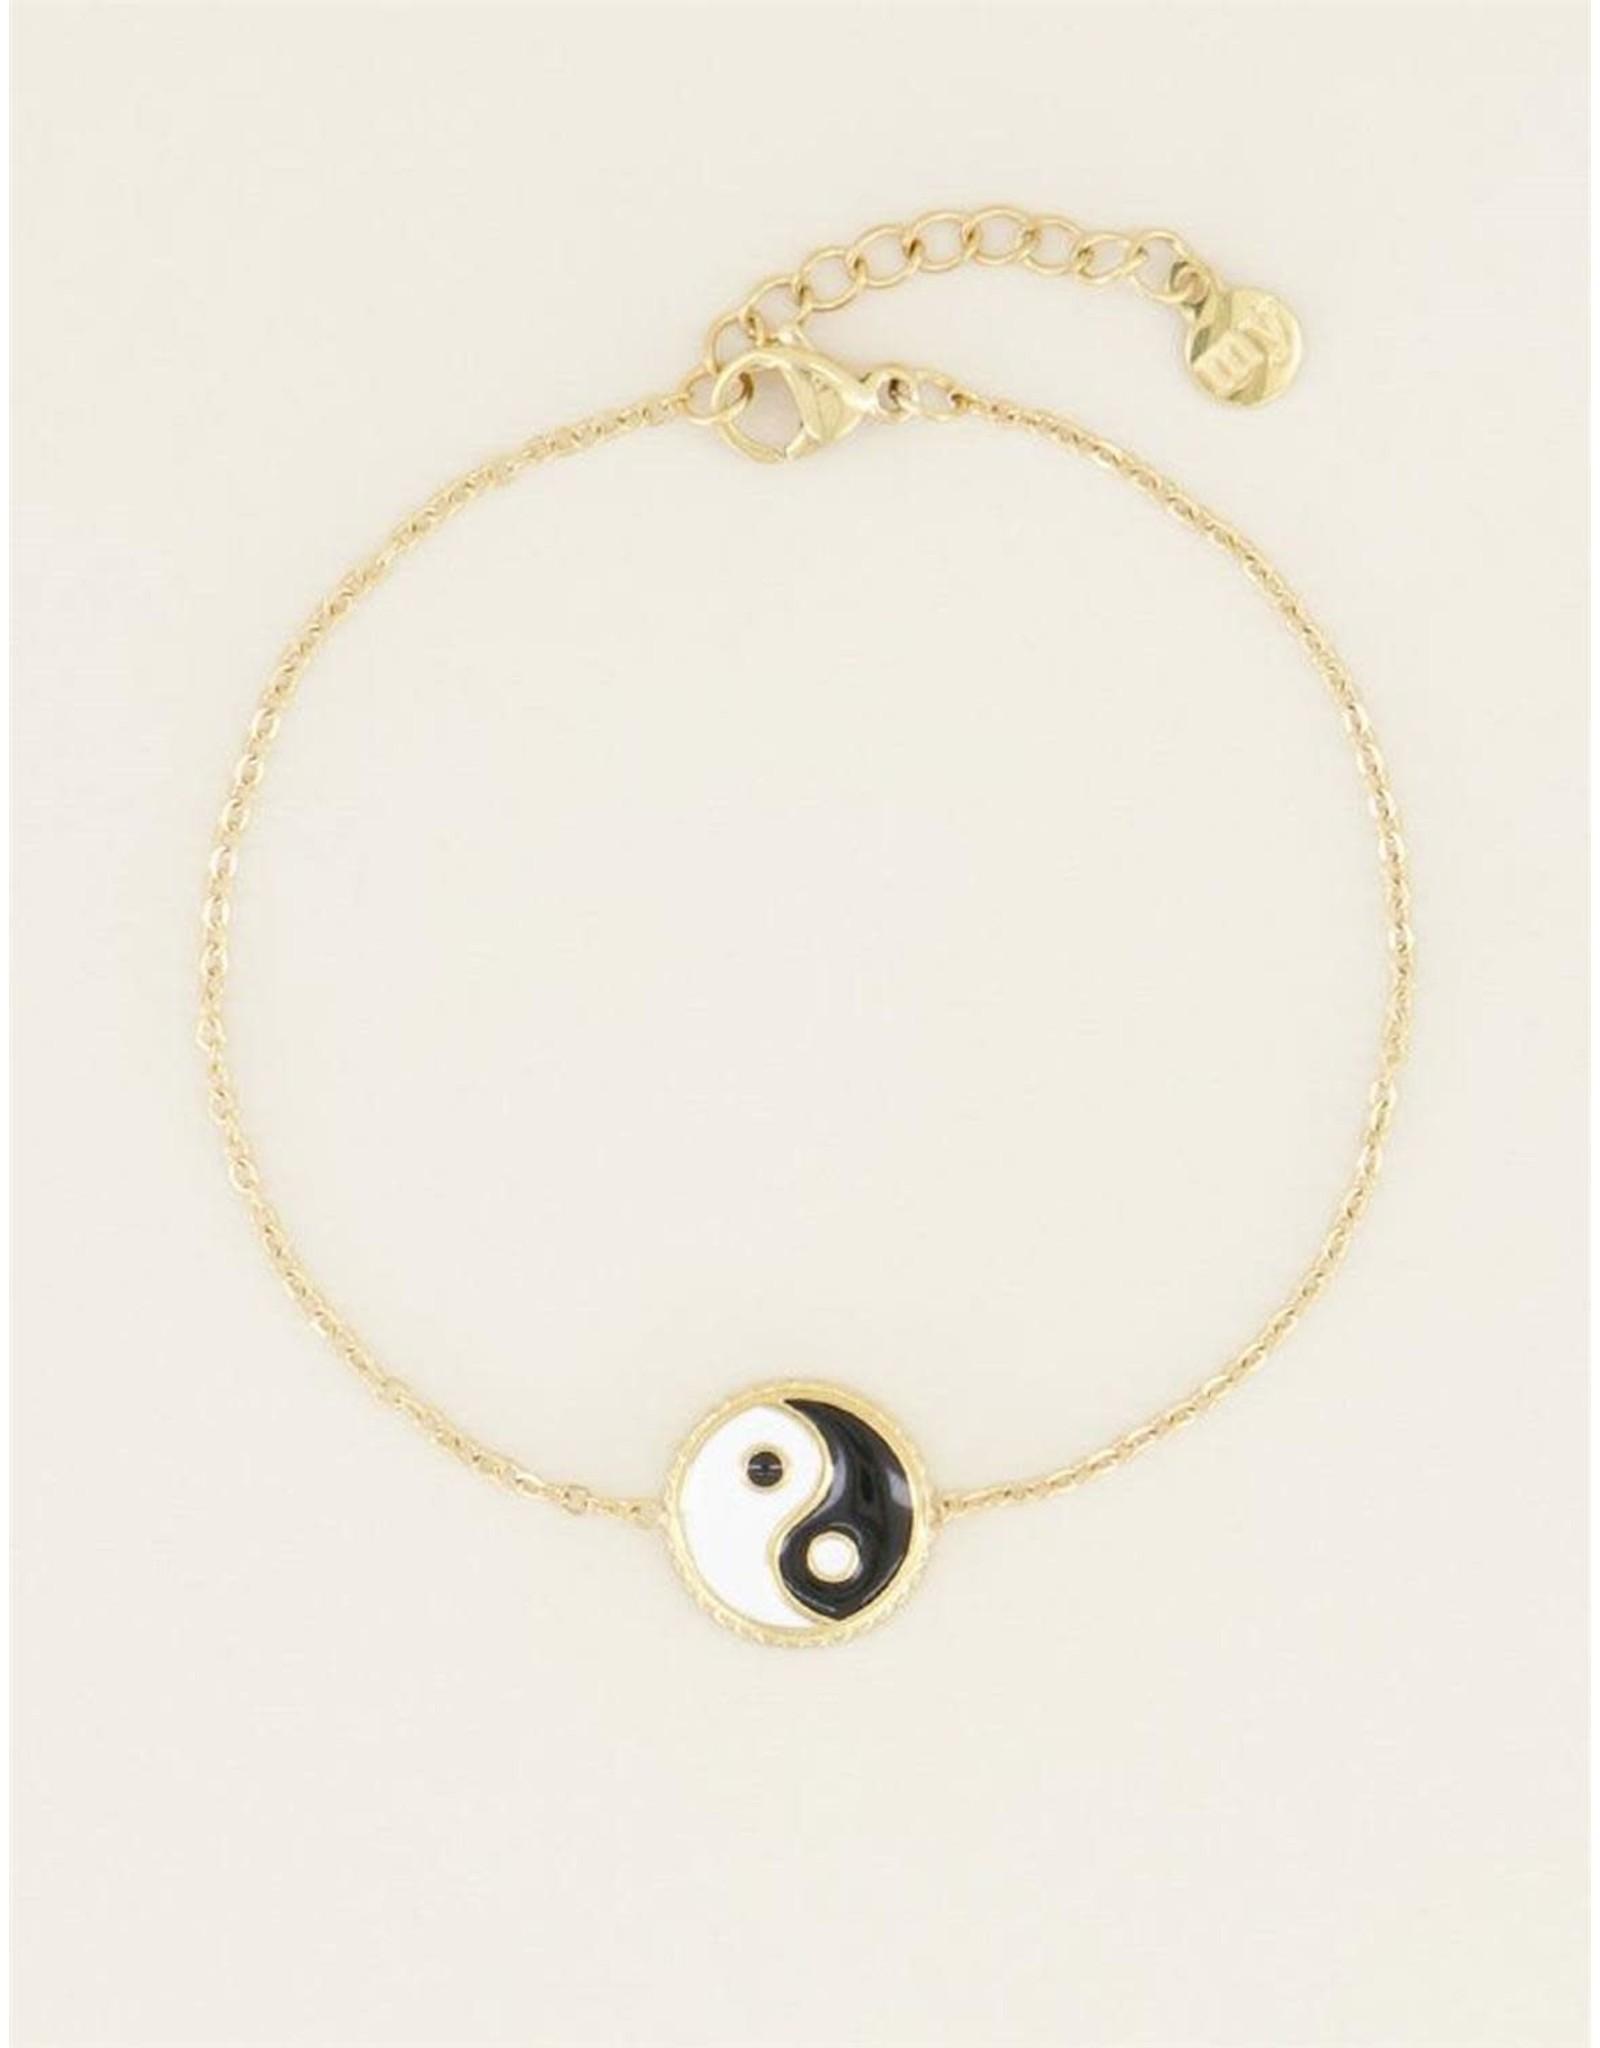 My Jewellery My Jewellery armband - ying yang